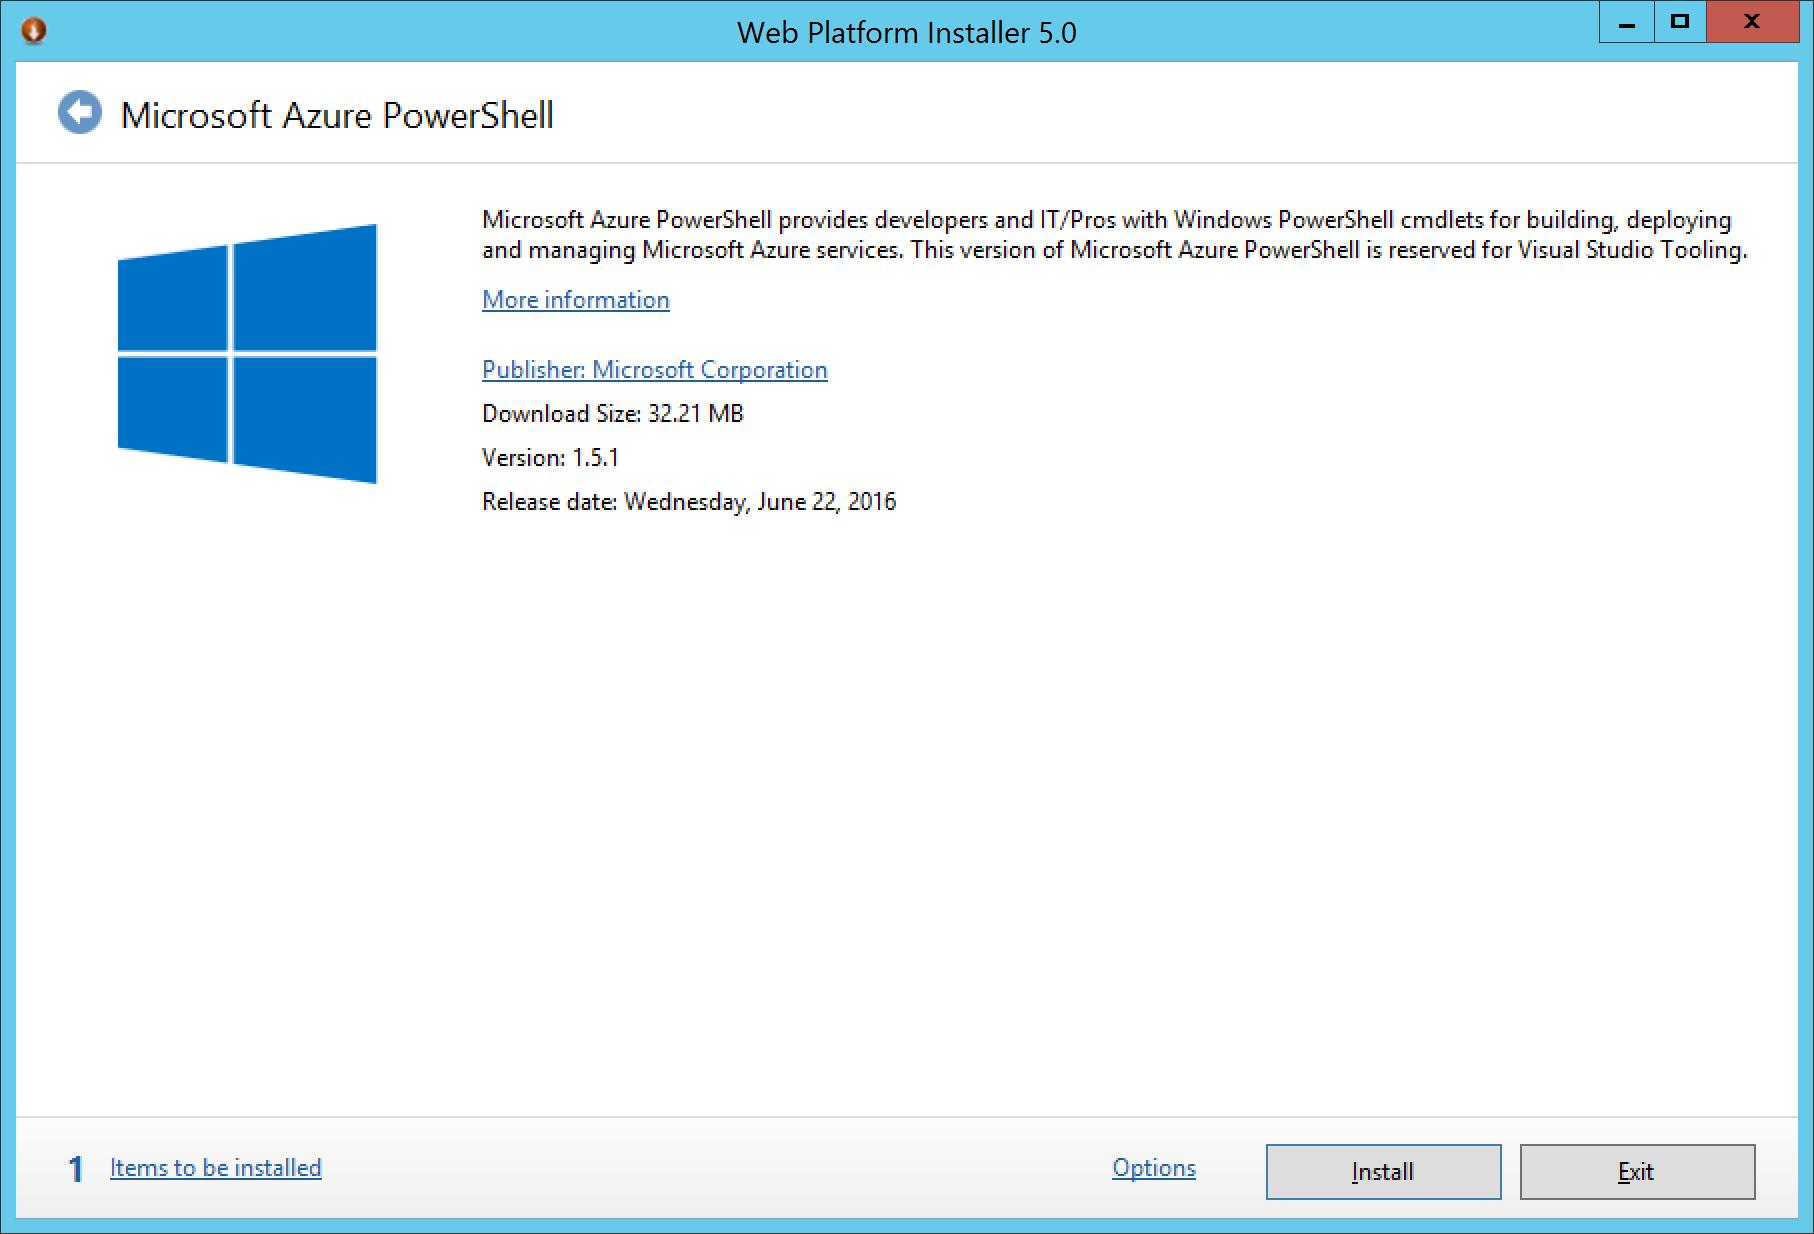 Web Platform Installer 5 - Microsoft Azure PowerShell